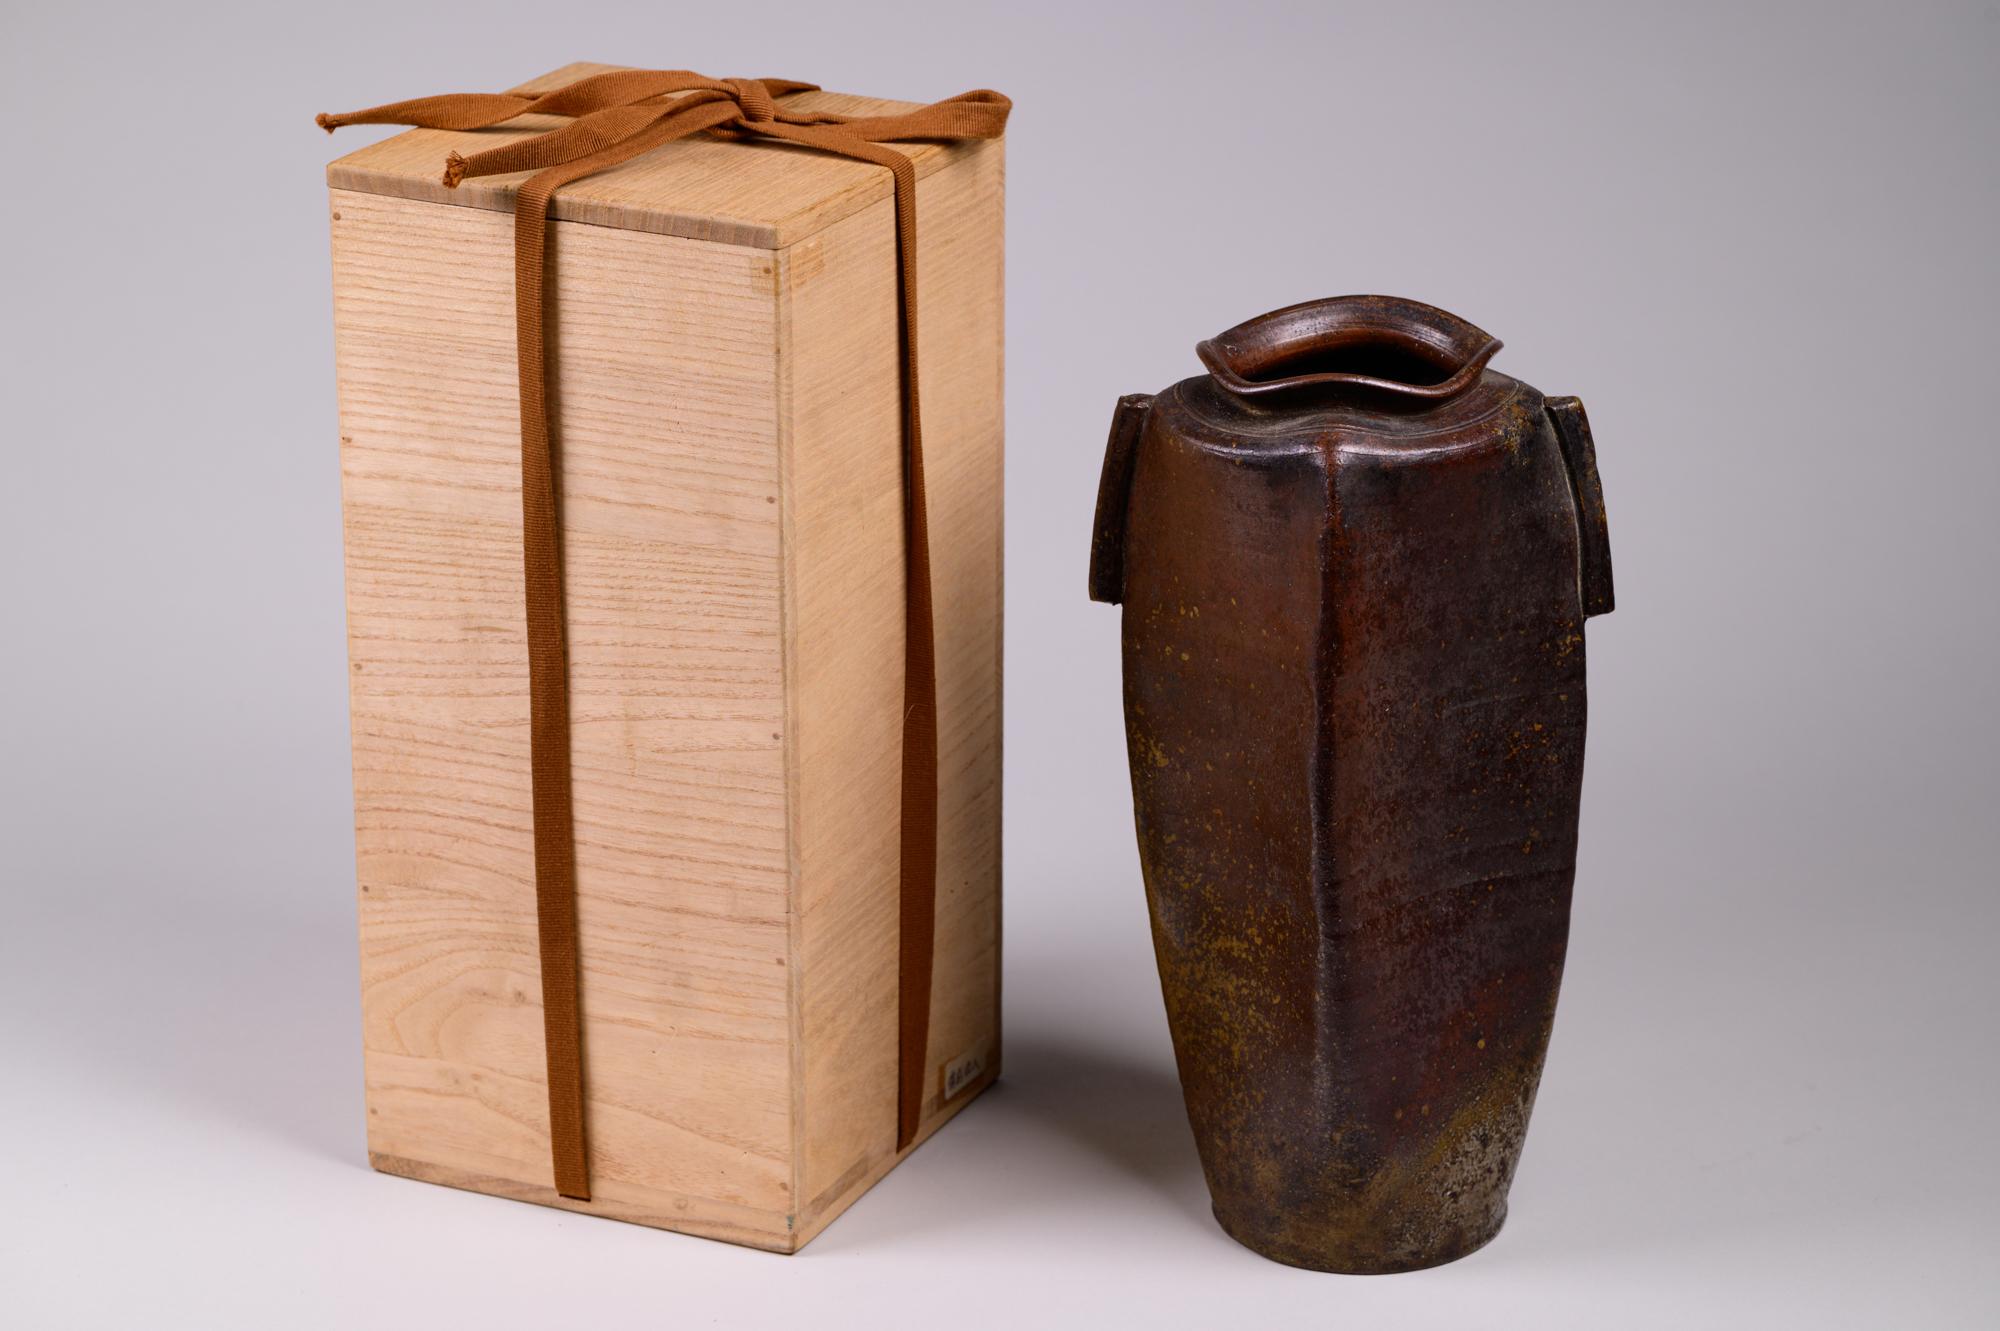 Japanese ceramic vase, antique vase, Bizen vase, Edo vase, antique ceramic vase, Bizen, Edo